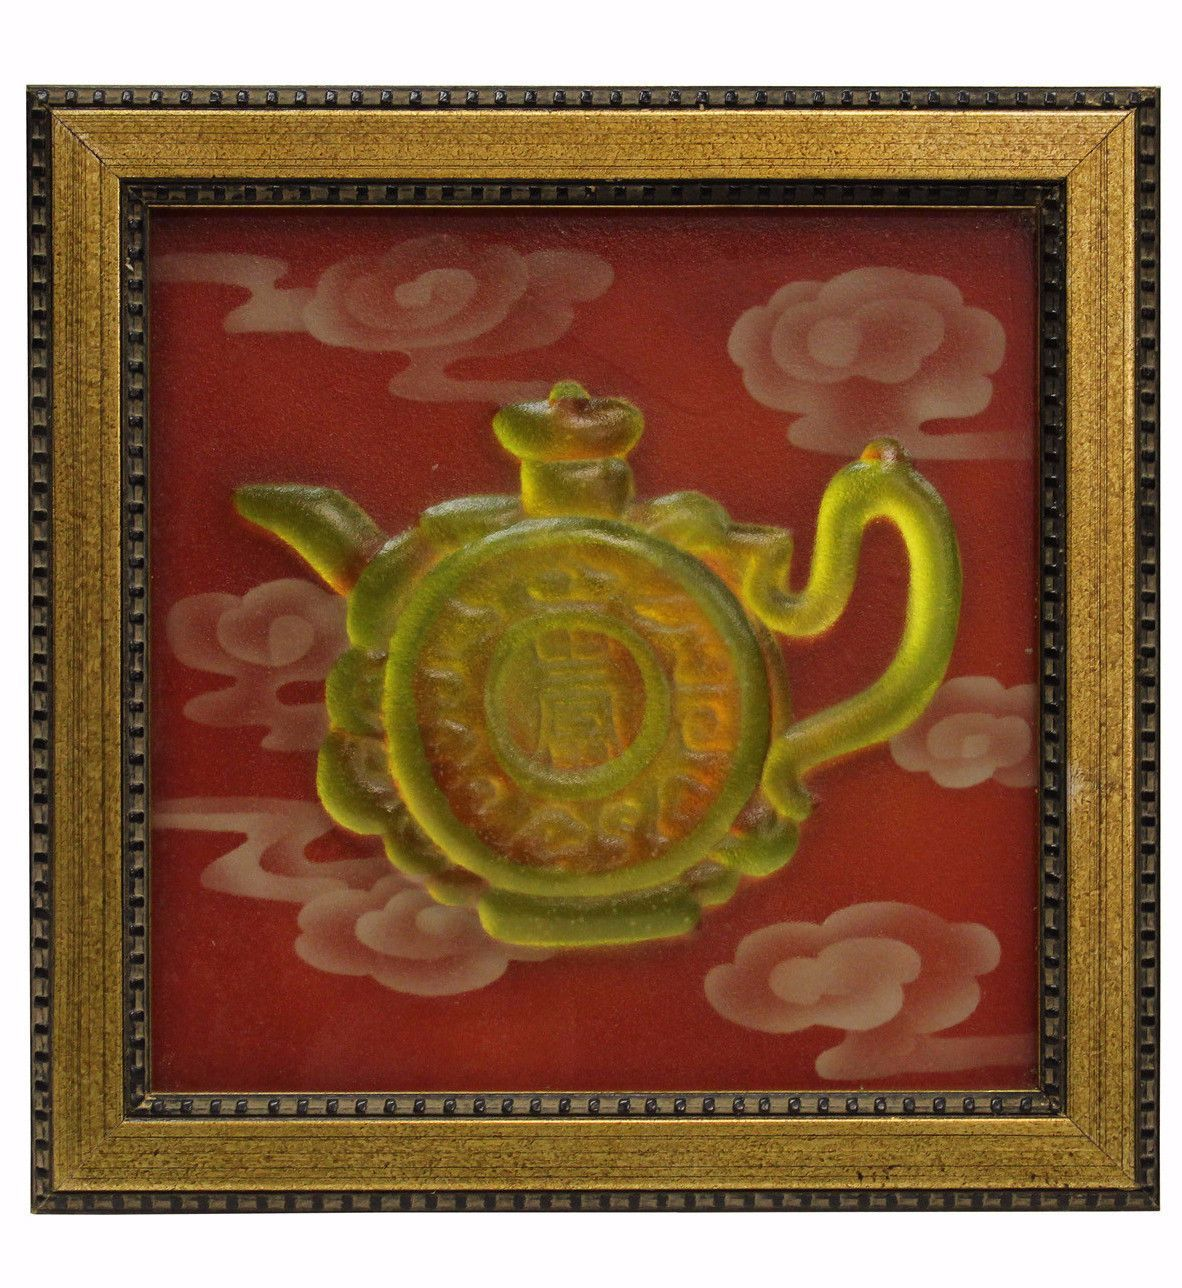 Solid Piece Liuli Glass 3D Teapot Pattern In Framed Wall Paint Art ...